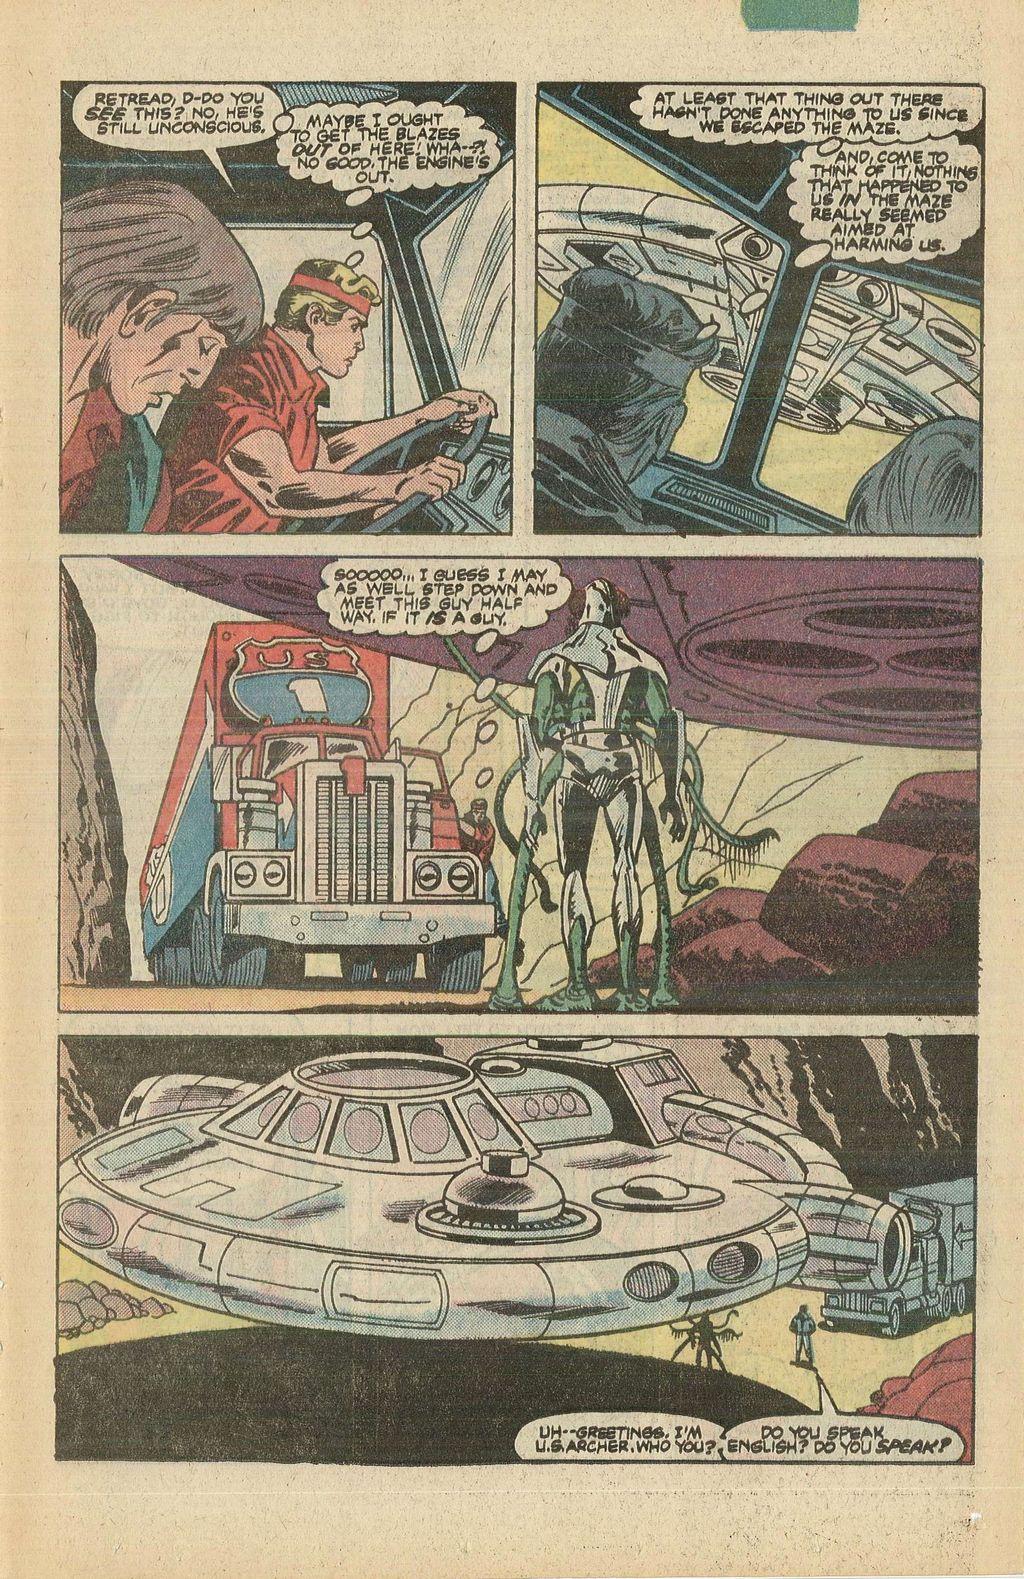 Read online U.S. 1 comic -  Issue #5 - 25